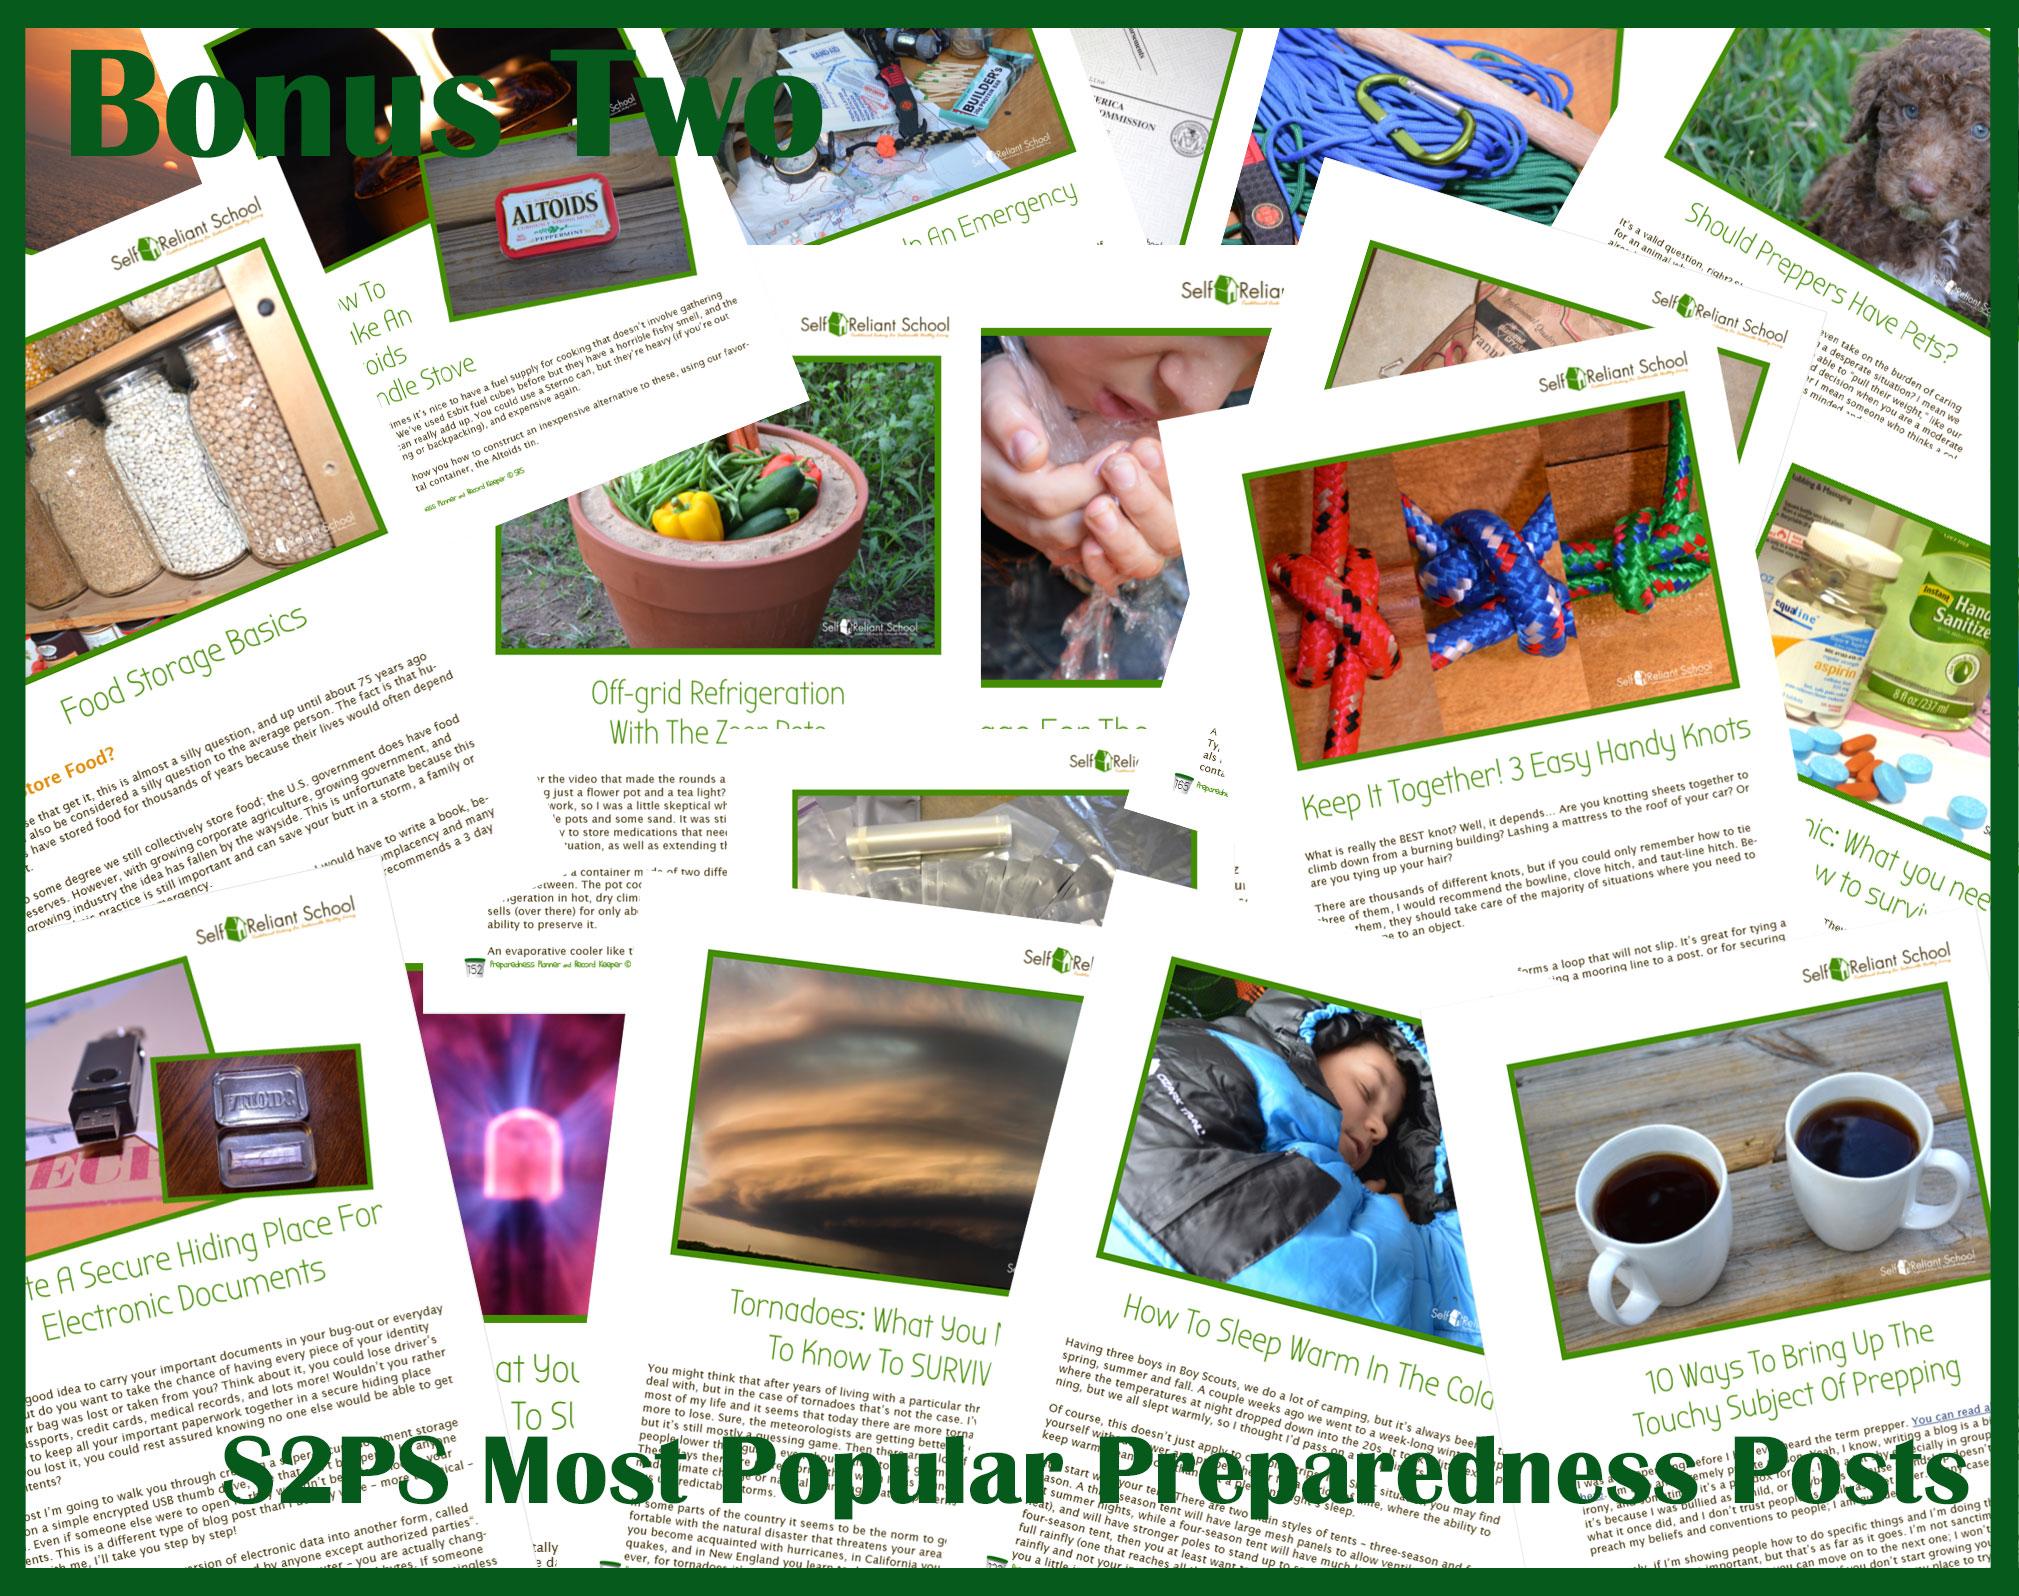 Bonus preparedness posts